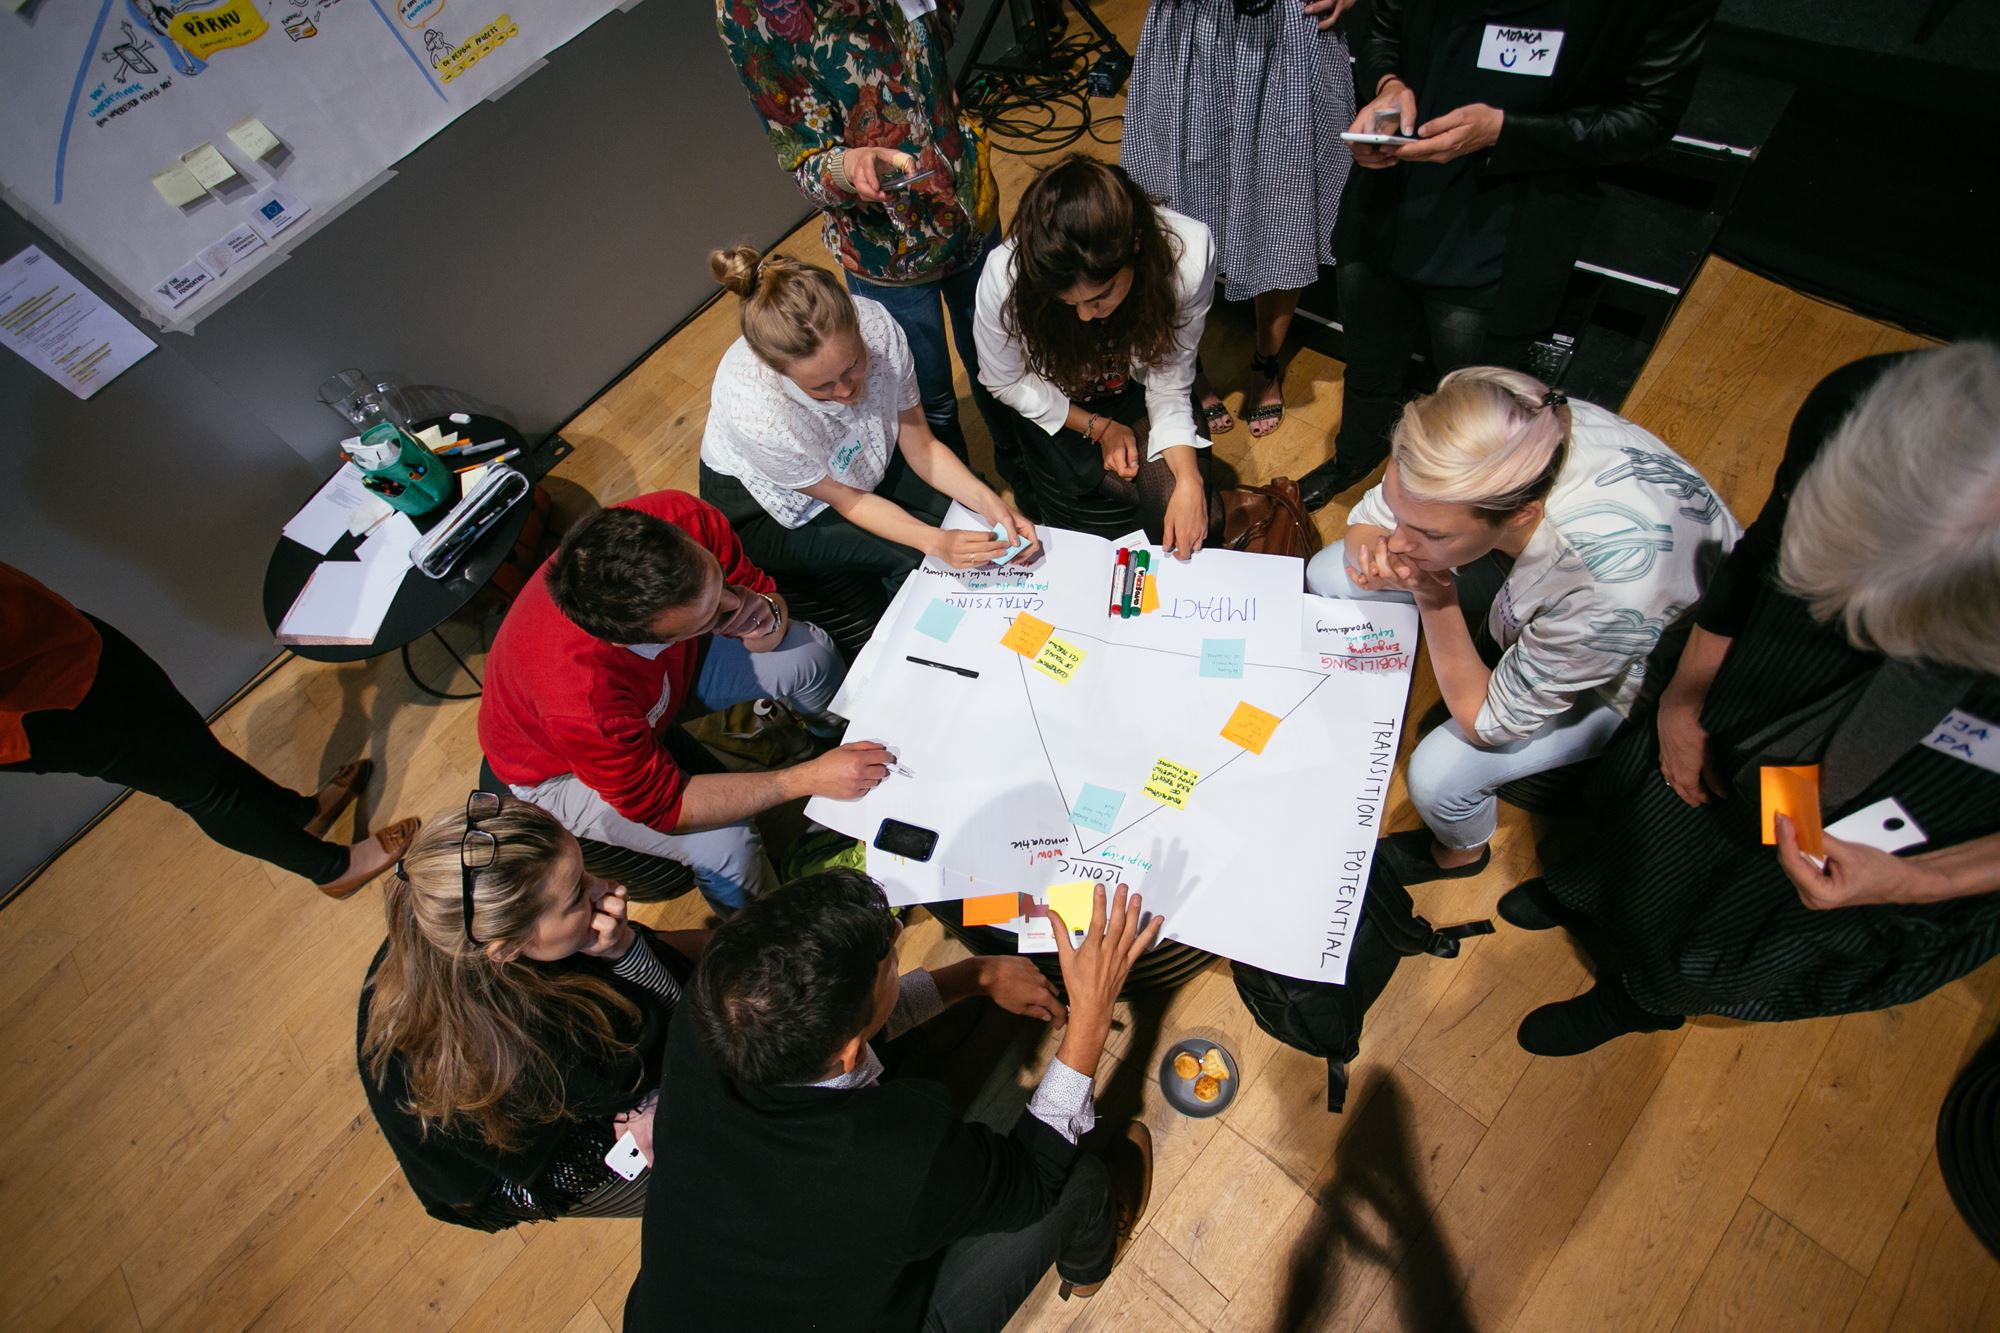 Experimentation with Social Innovation - Social Innovation Community